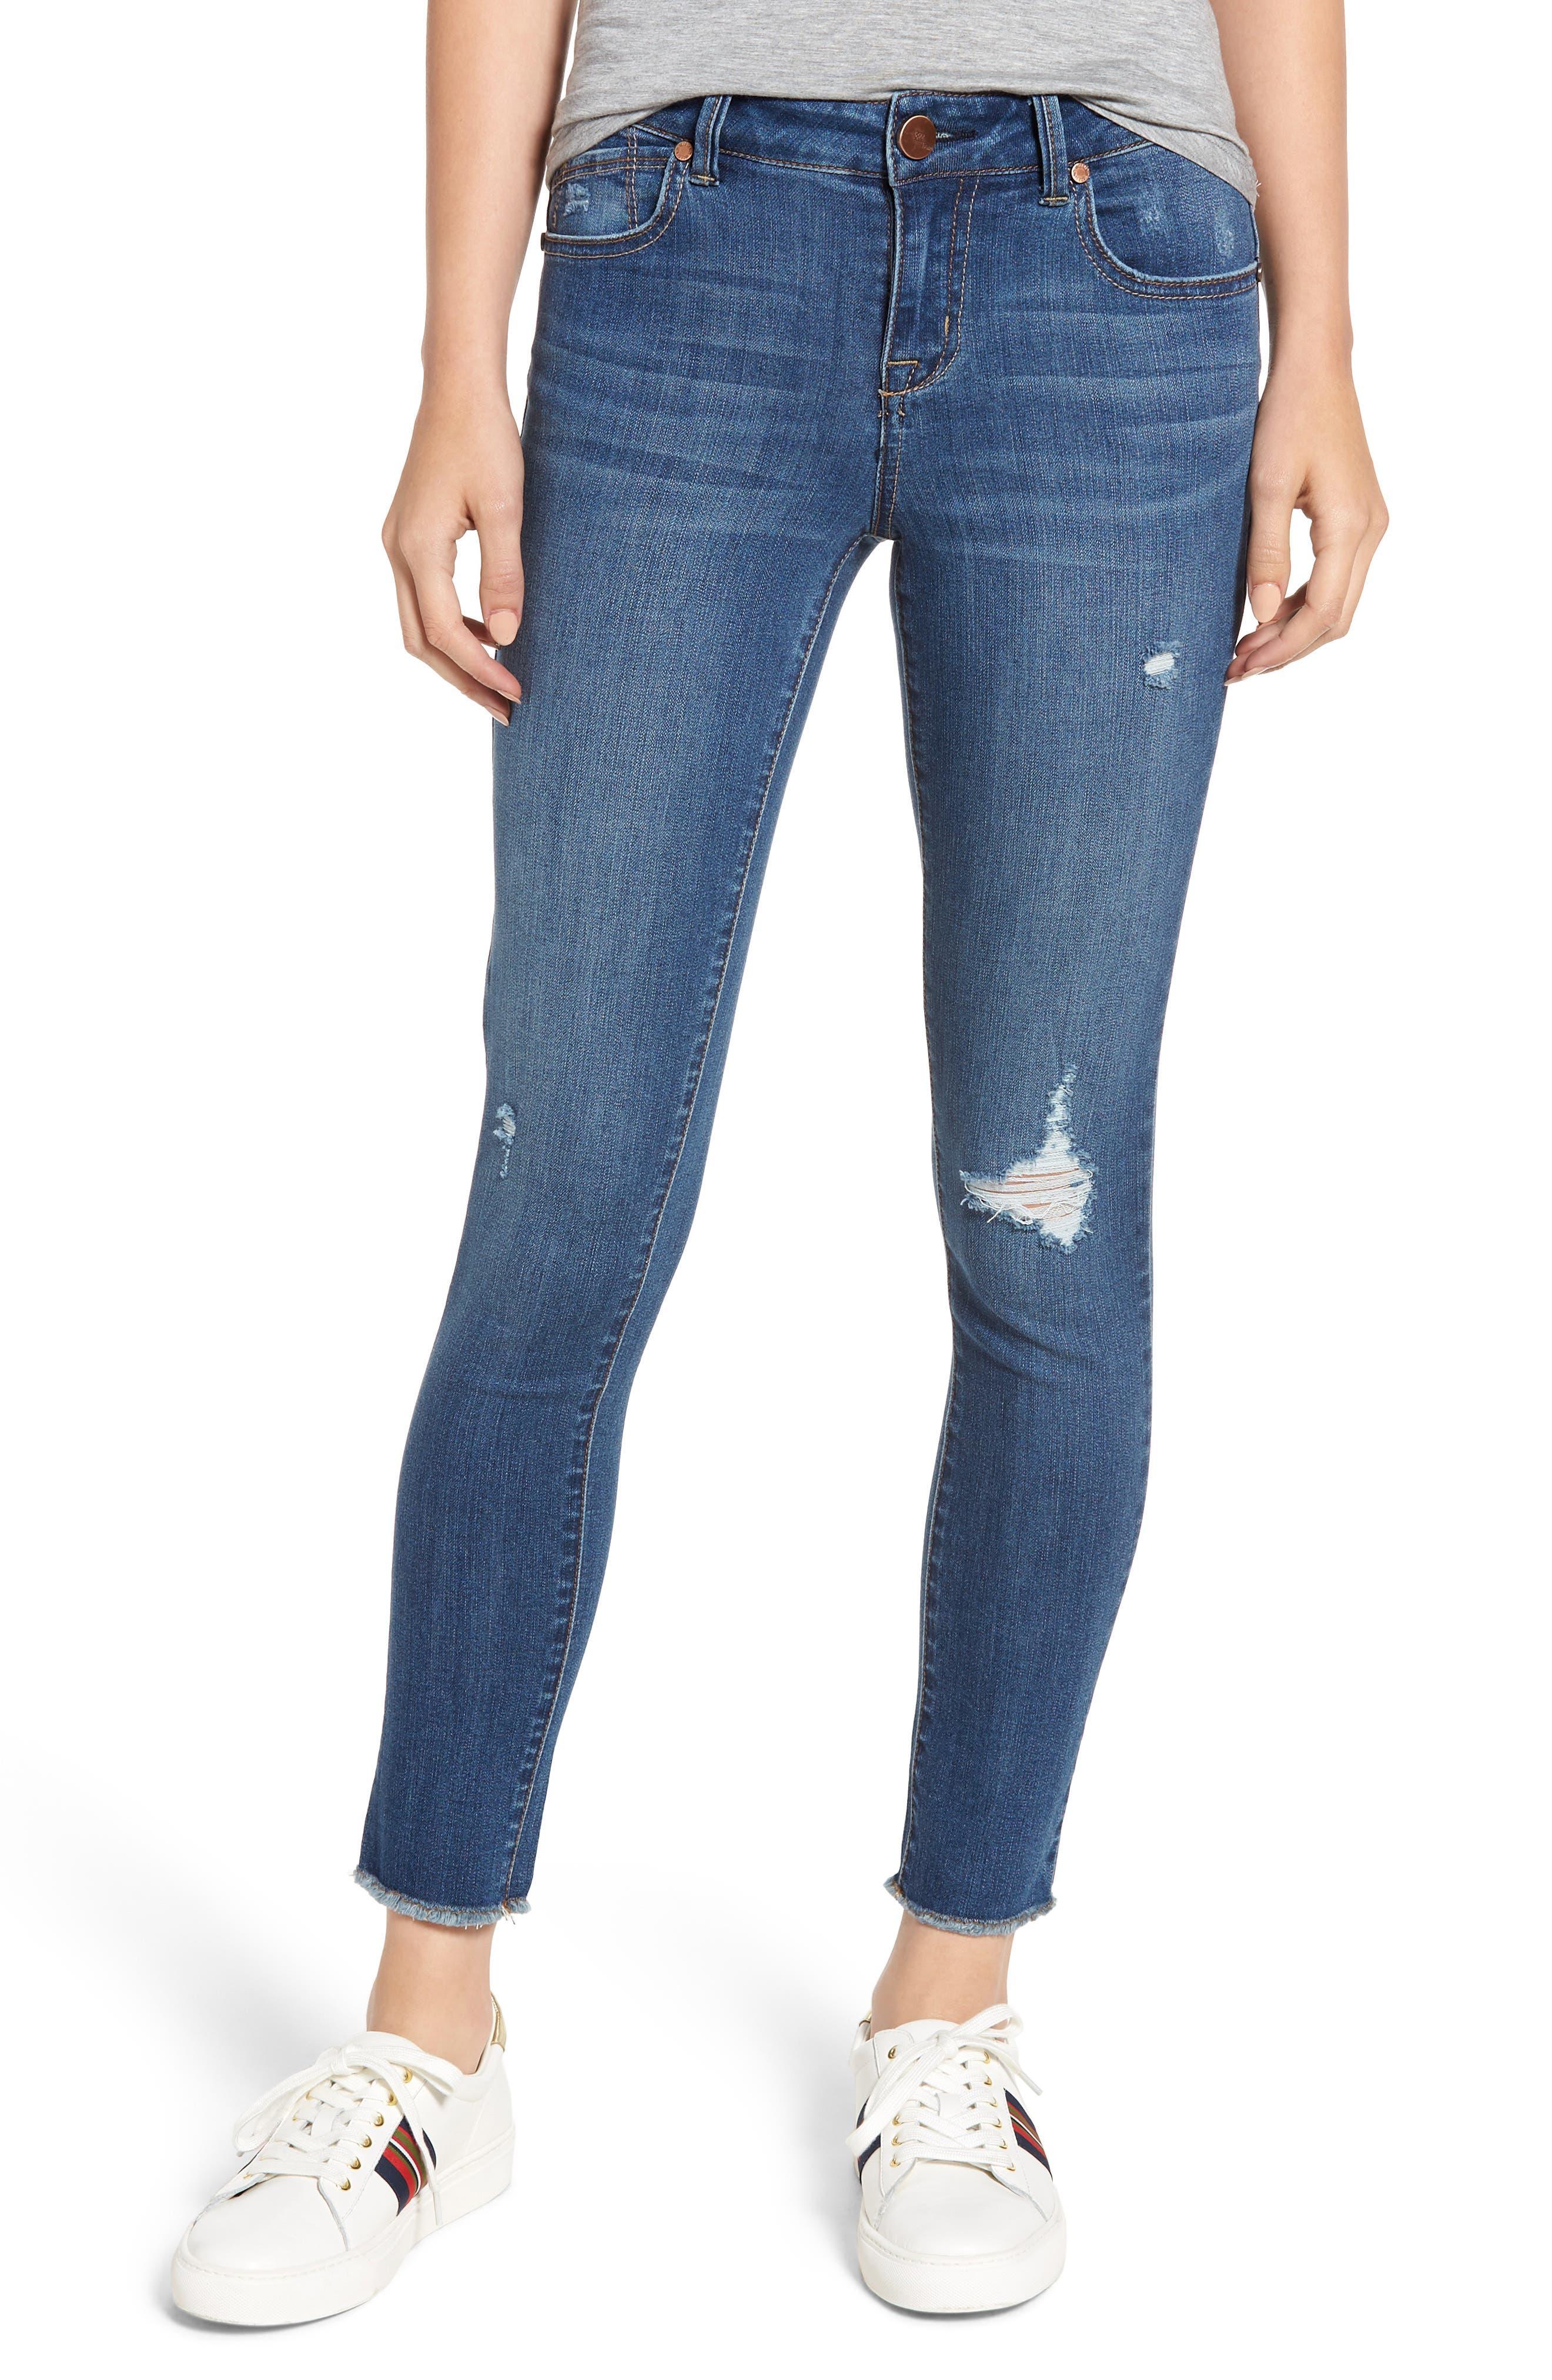 1822 DENIM Distressed Skinny Jeans, Main, color, CHRISTINA